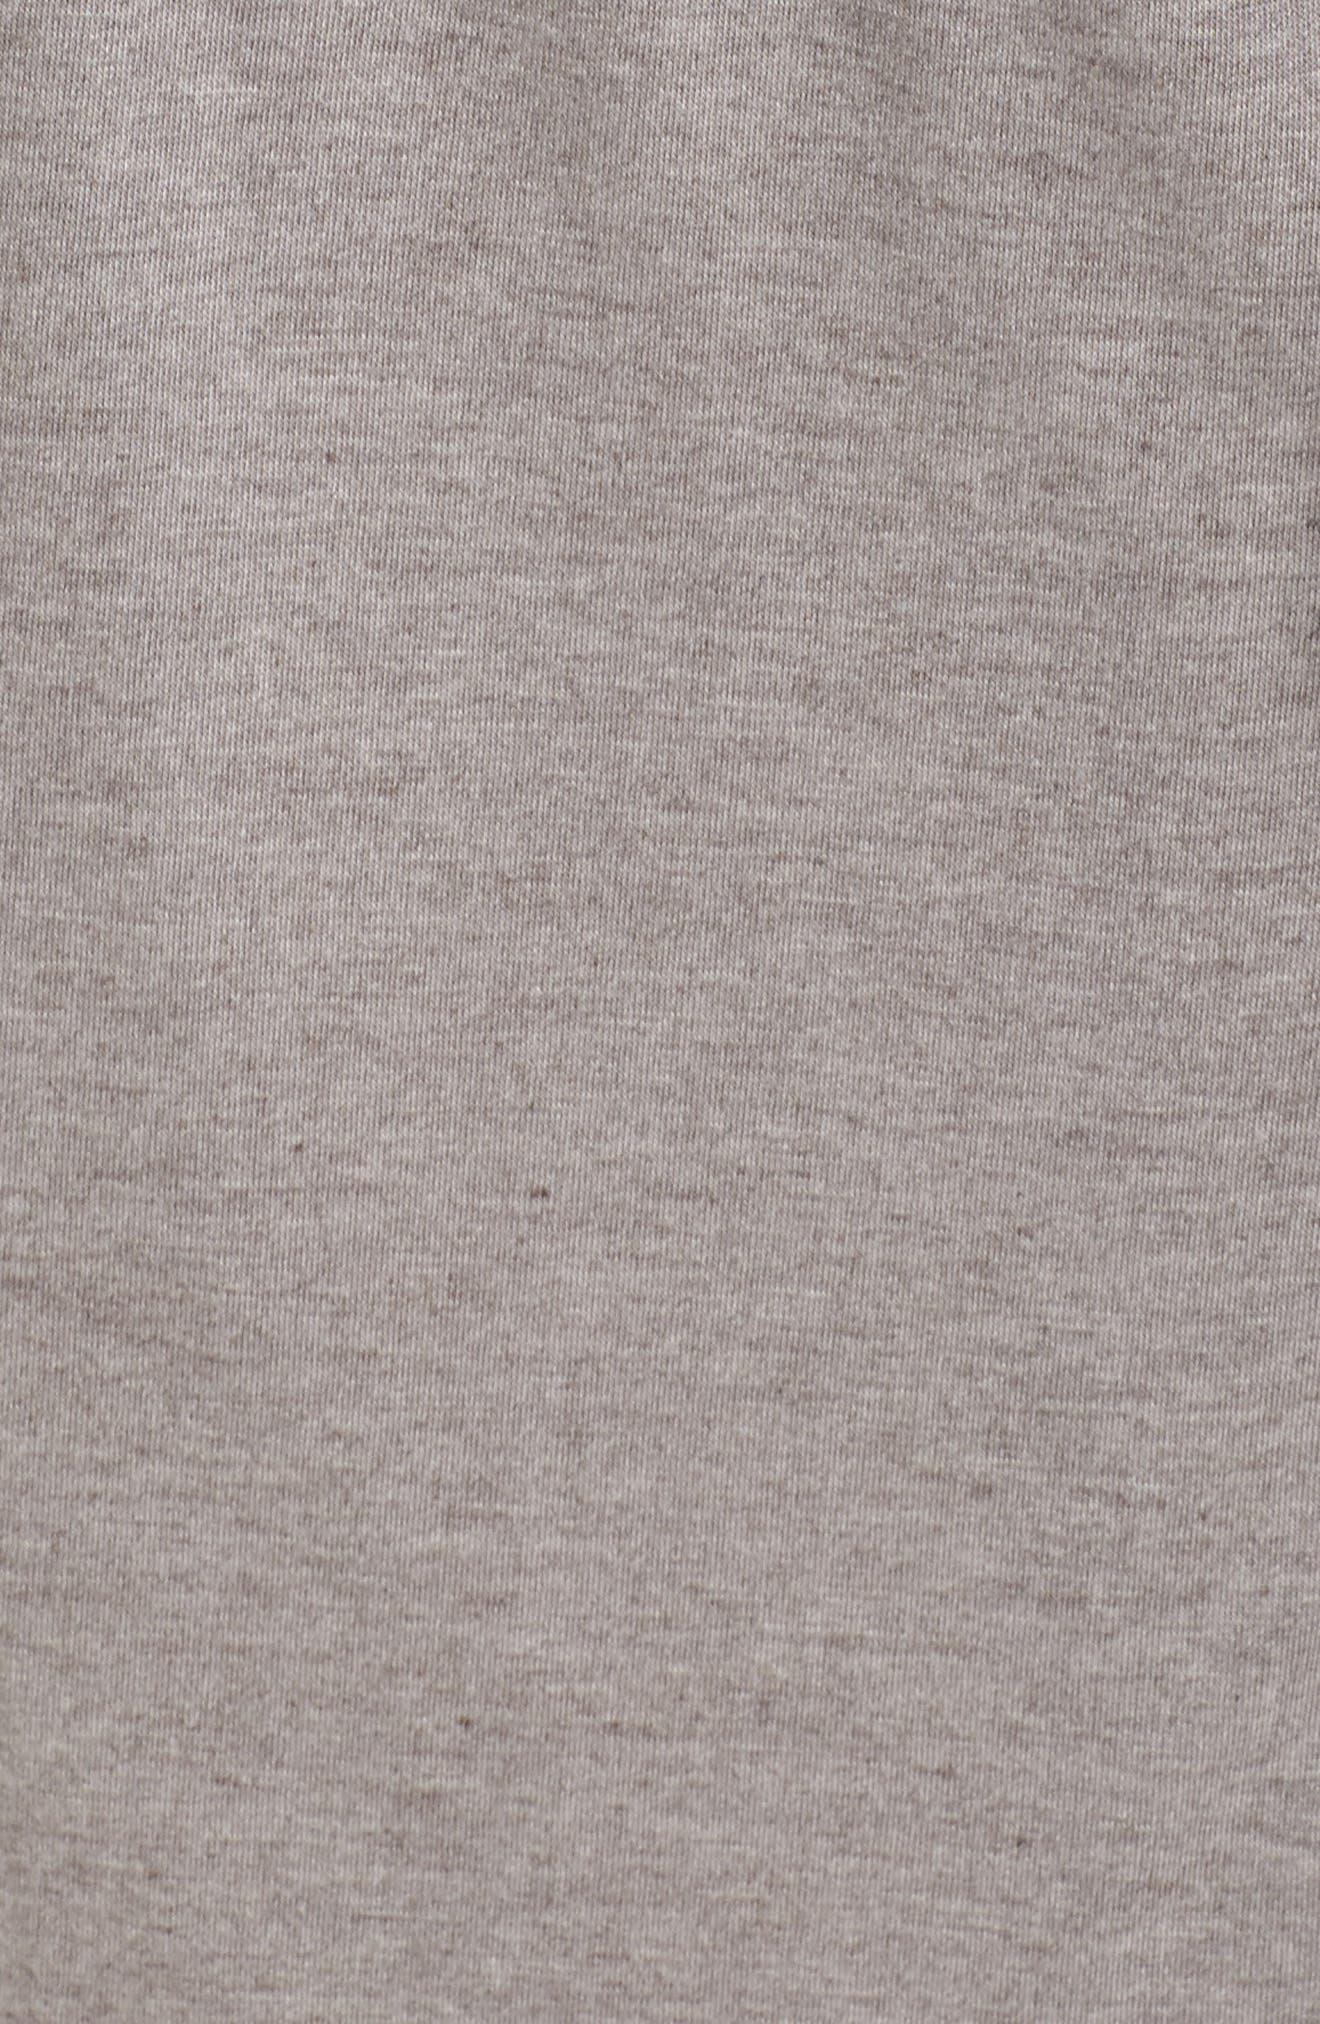 'Shangri-La' Robe,                             Alternate thumbnail 5, color,                             250